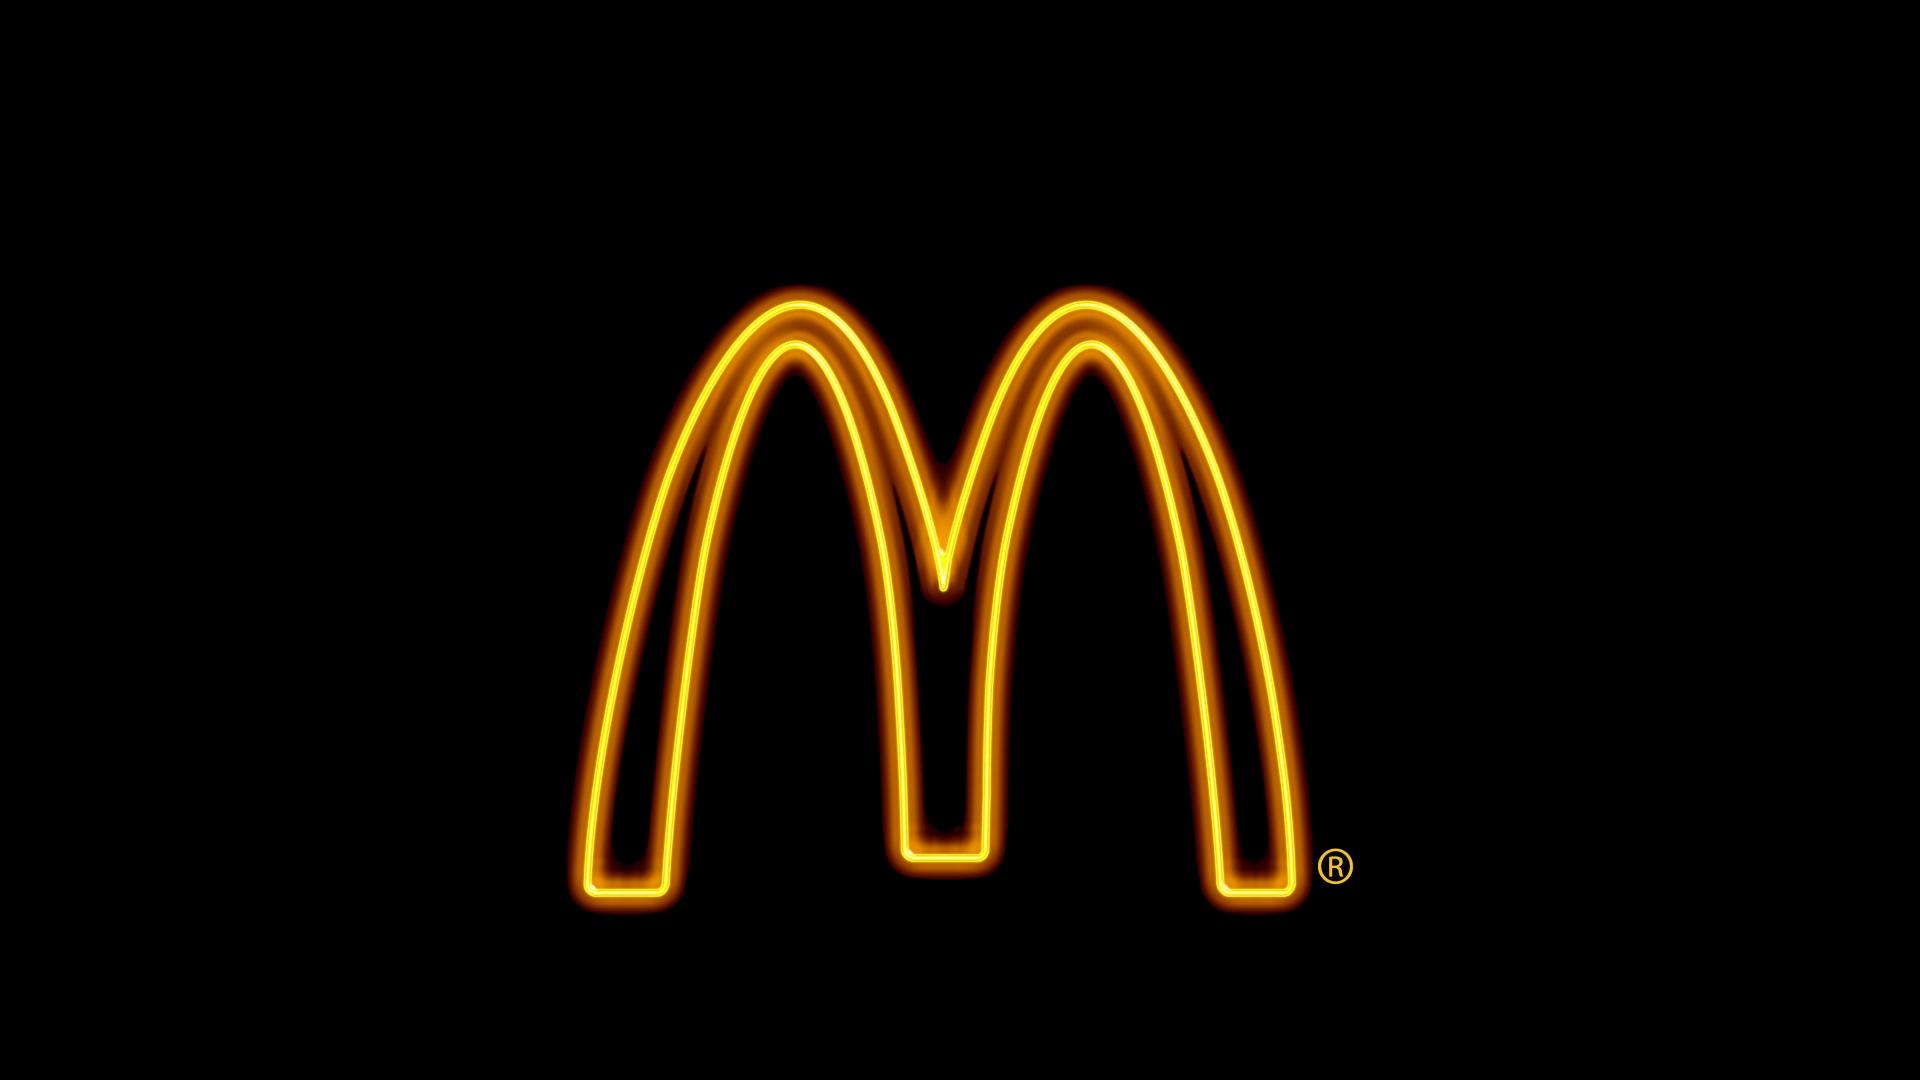 Mcdonalds-Logo-High-Definition-Wallpapers-1080p